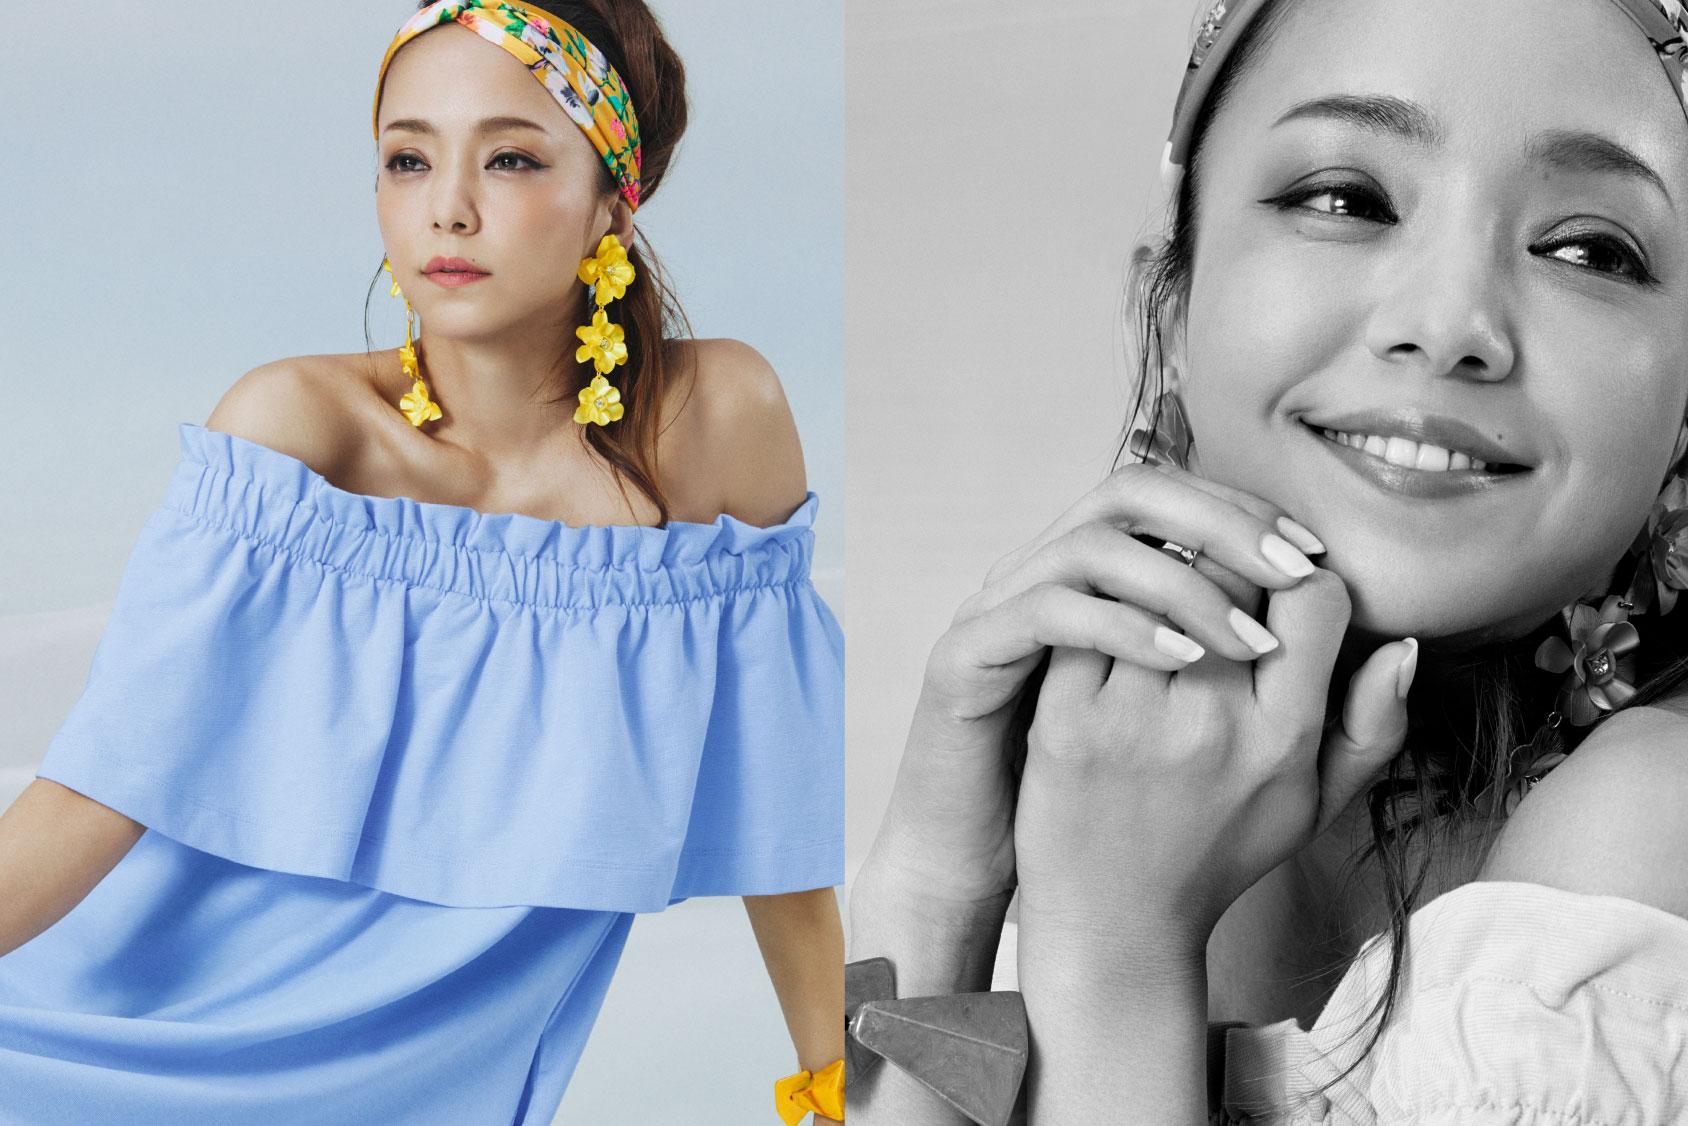 Namie Amuro x H&M: dress